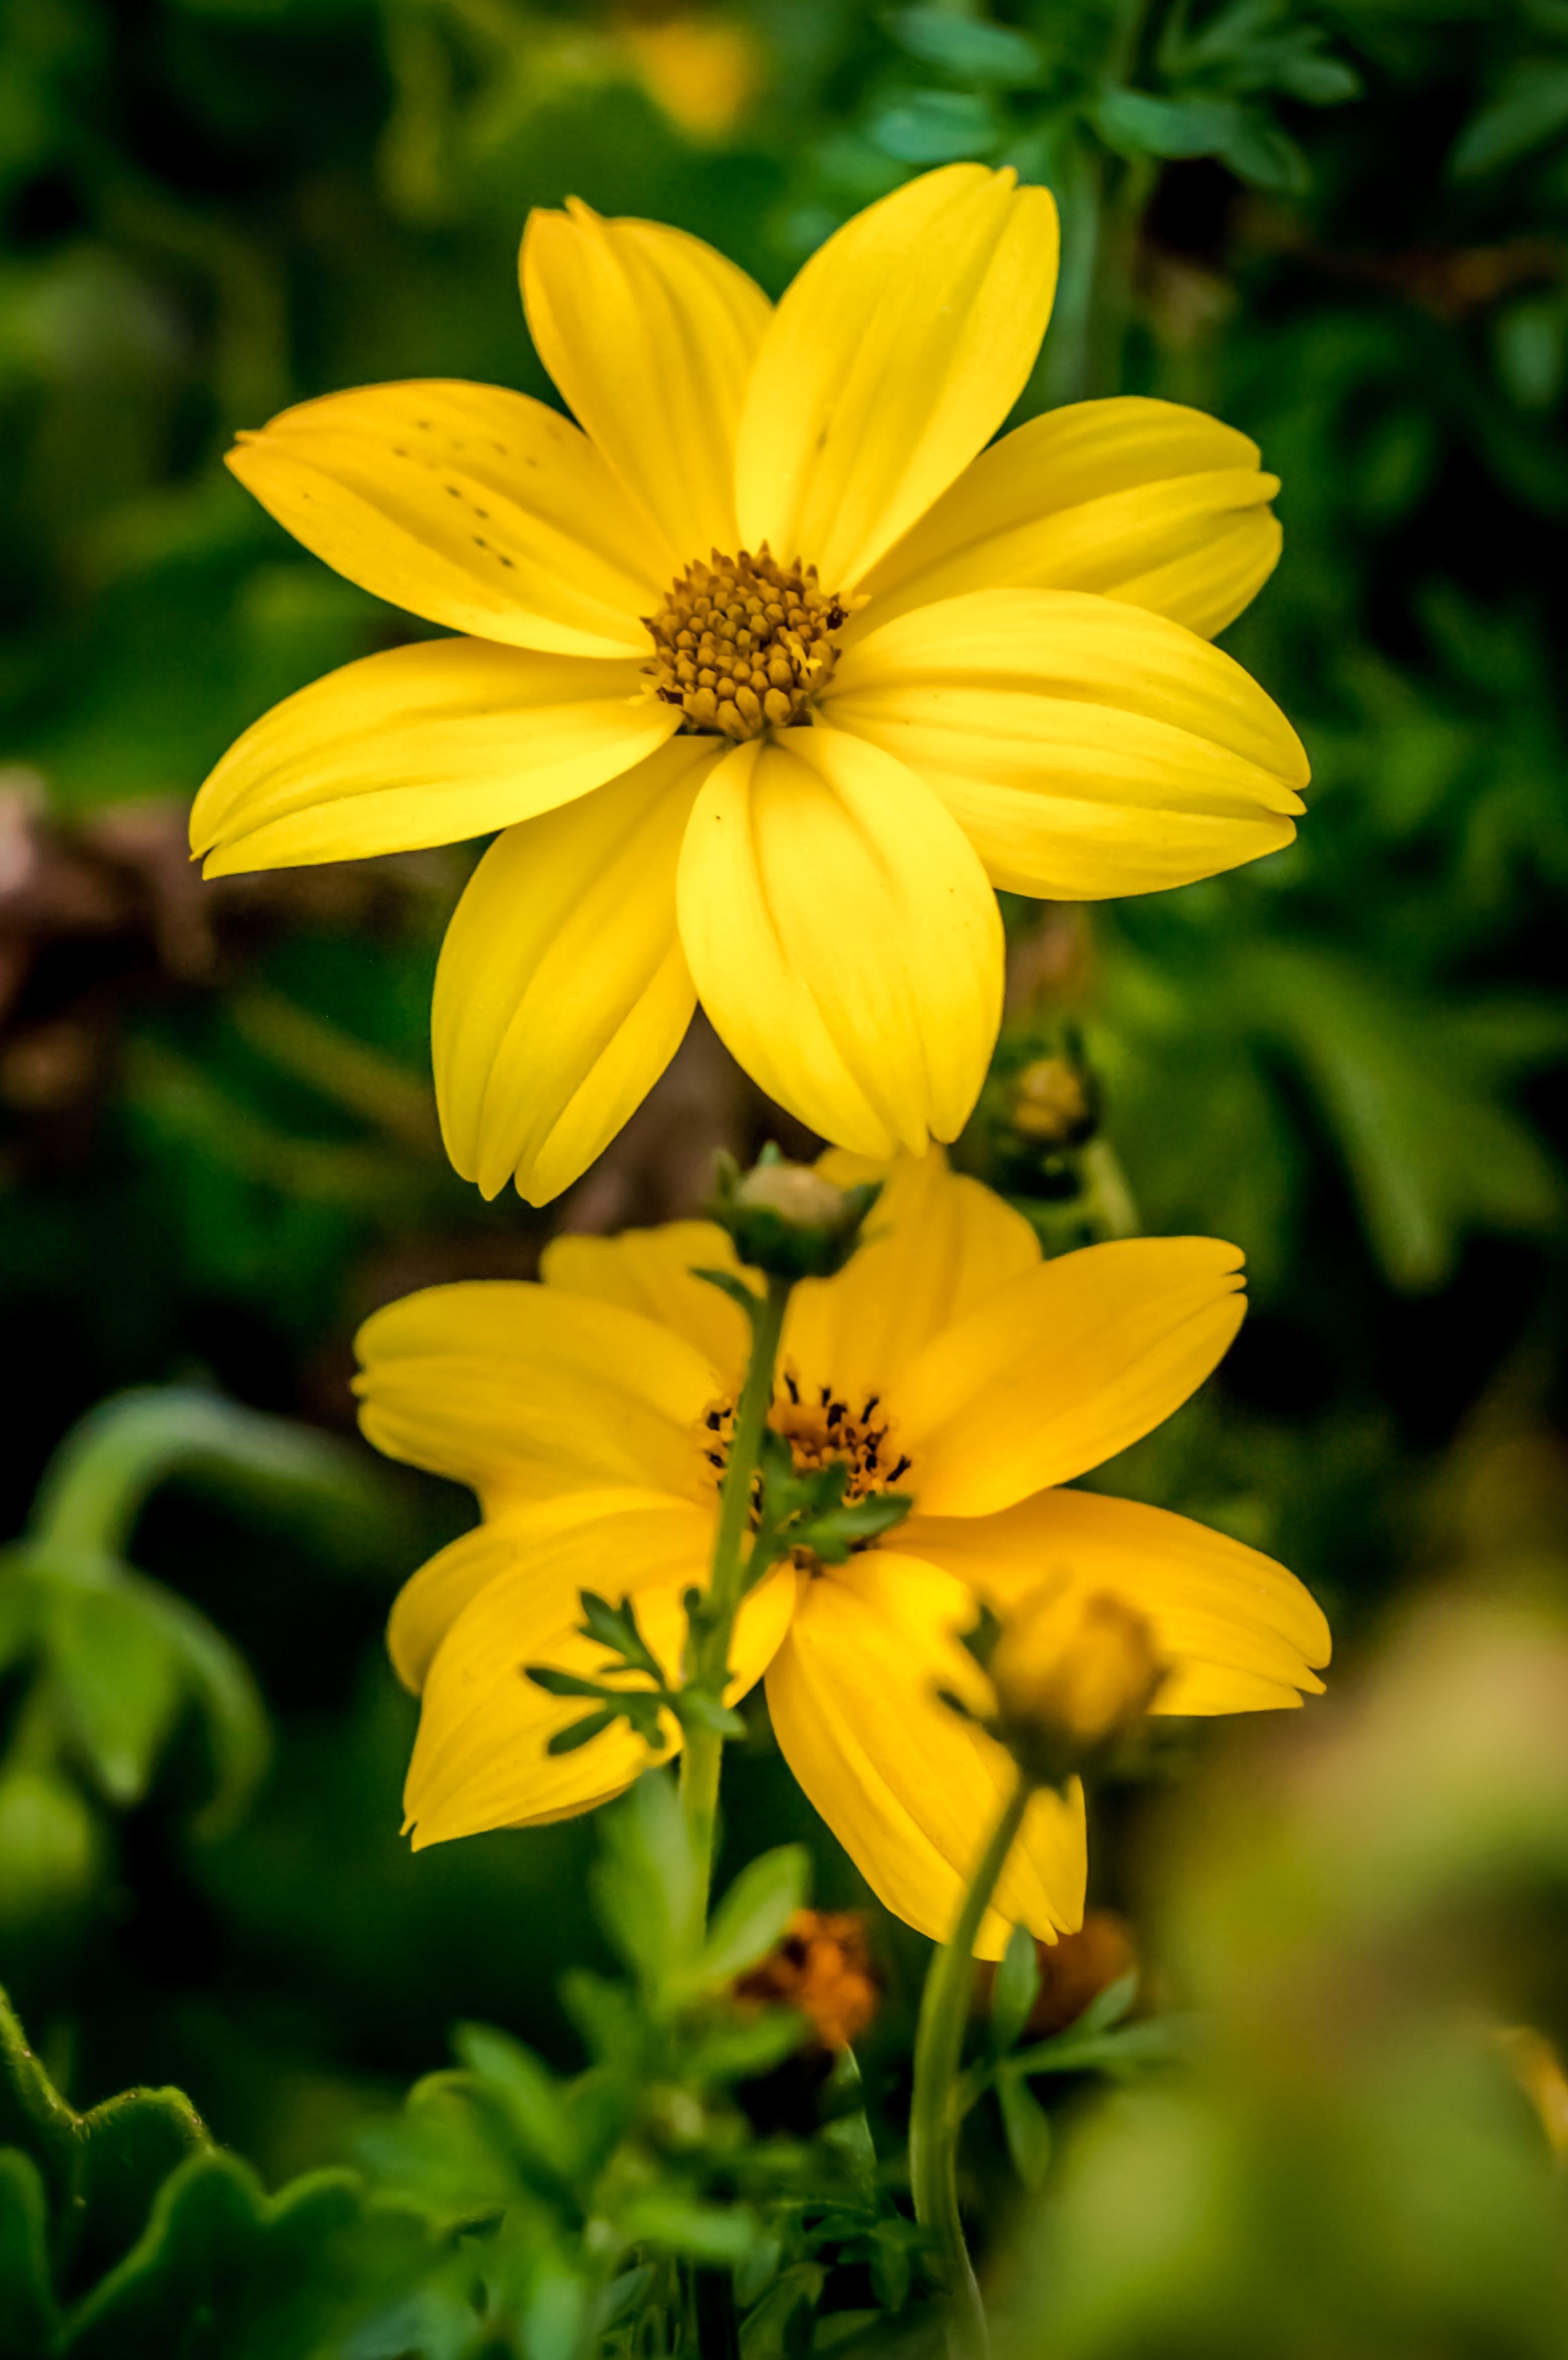 closeup, flowers, nature